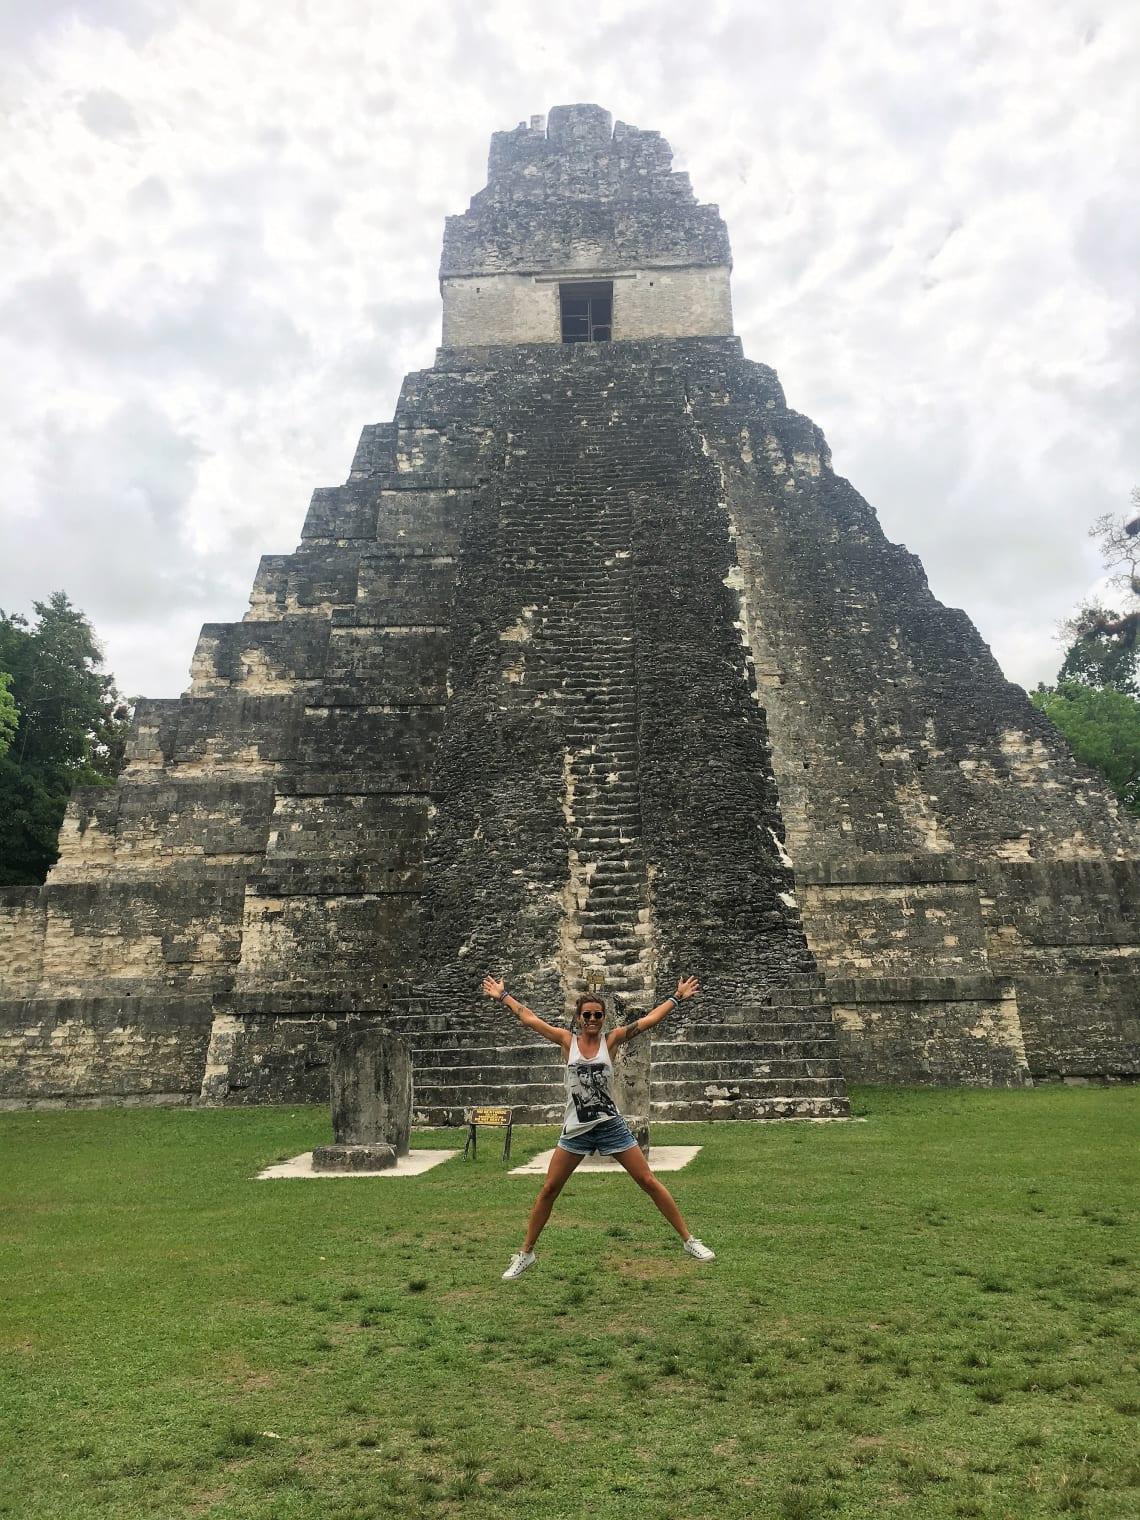 Ruínas Mayas em Tikal, Guatemala